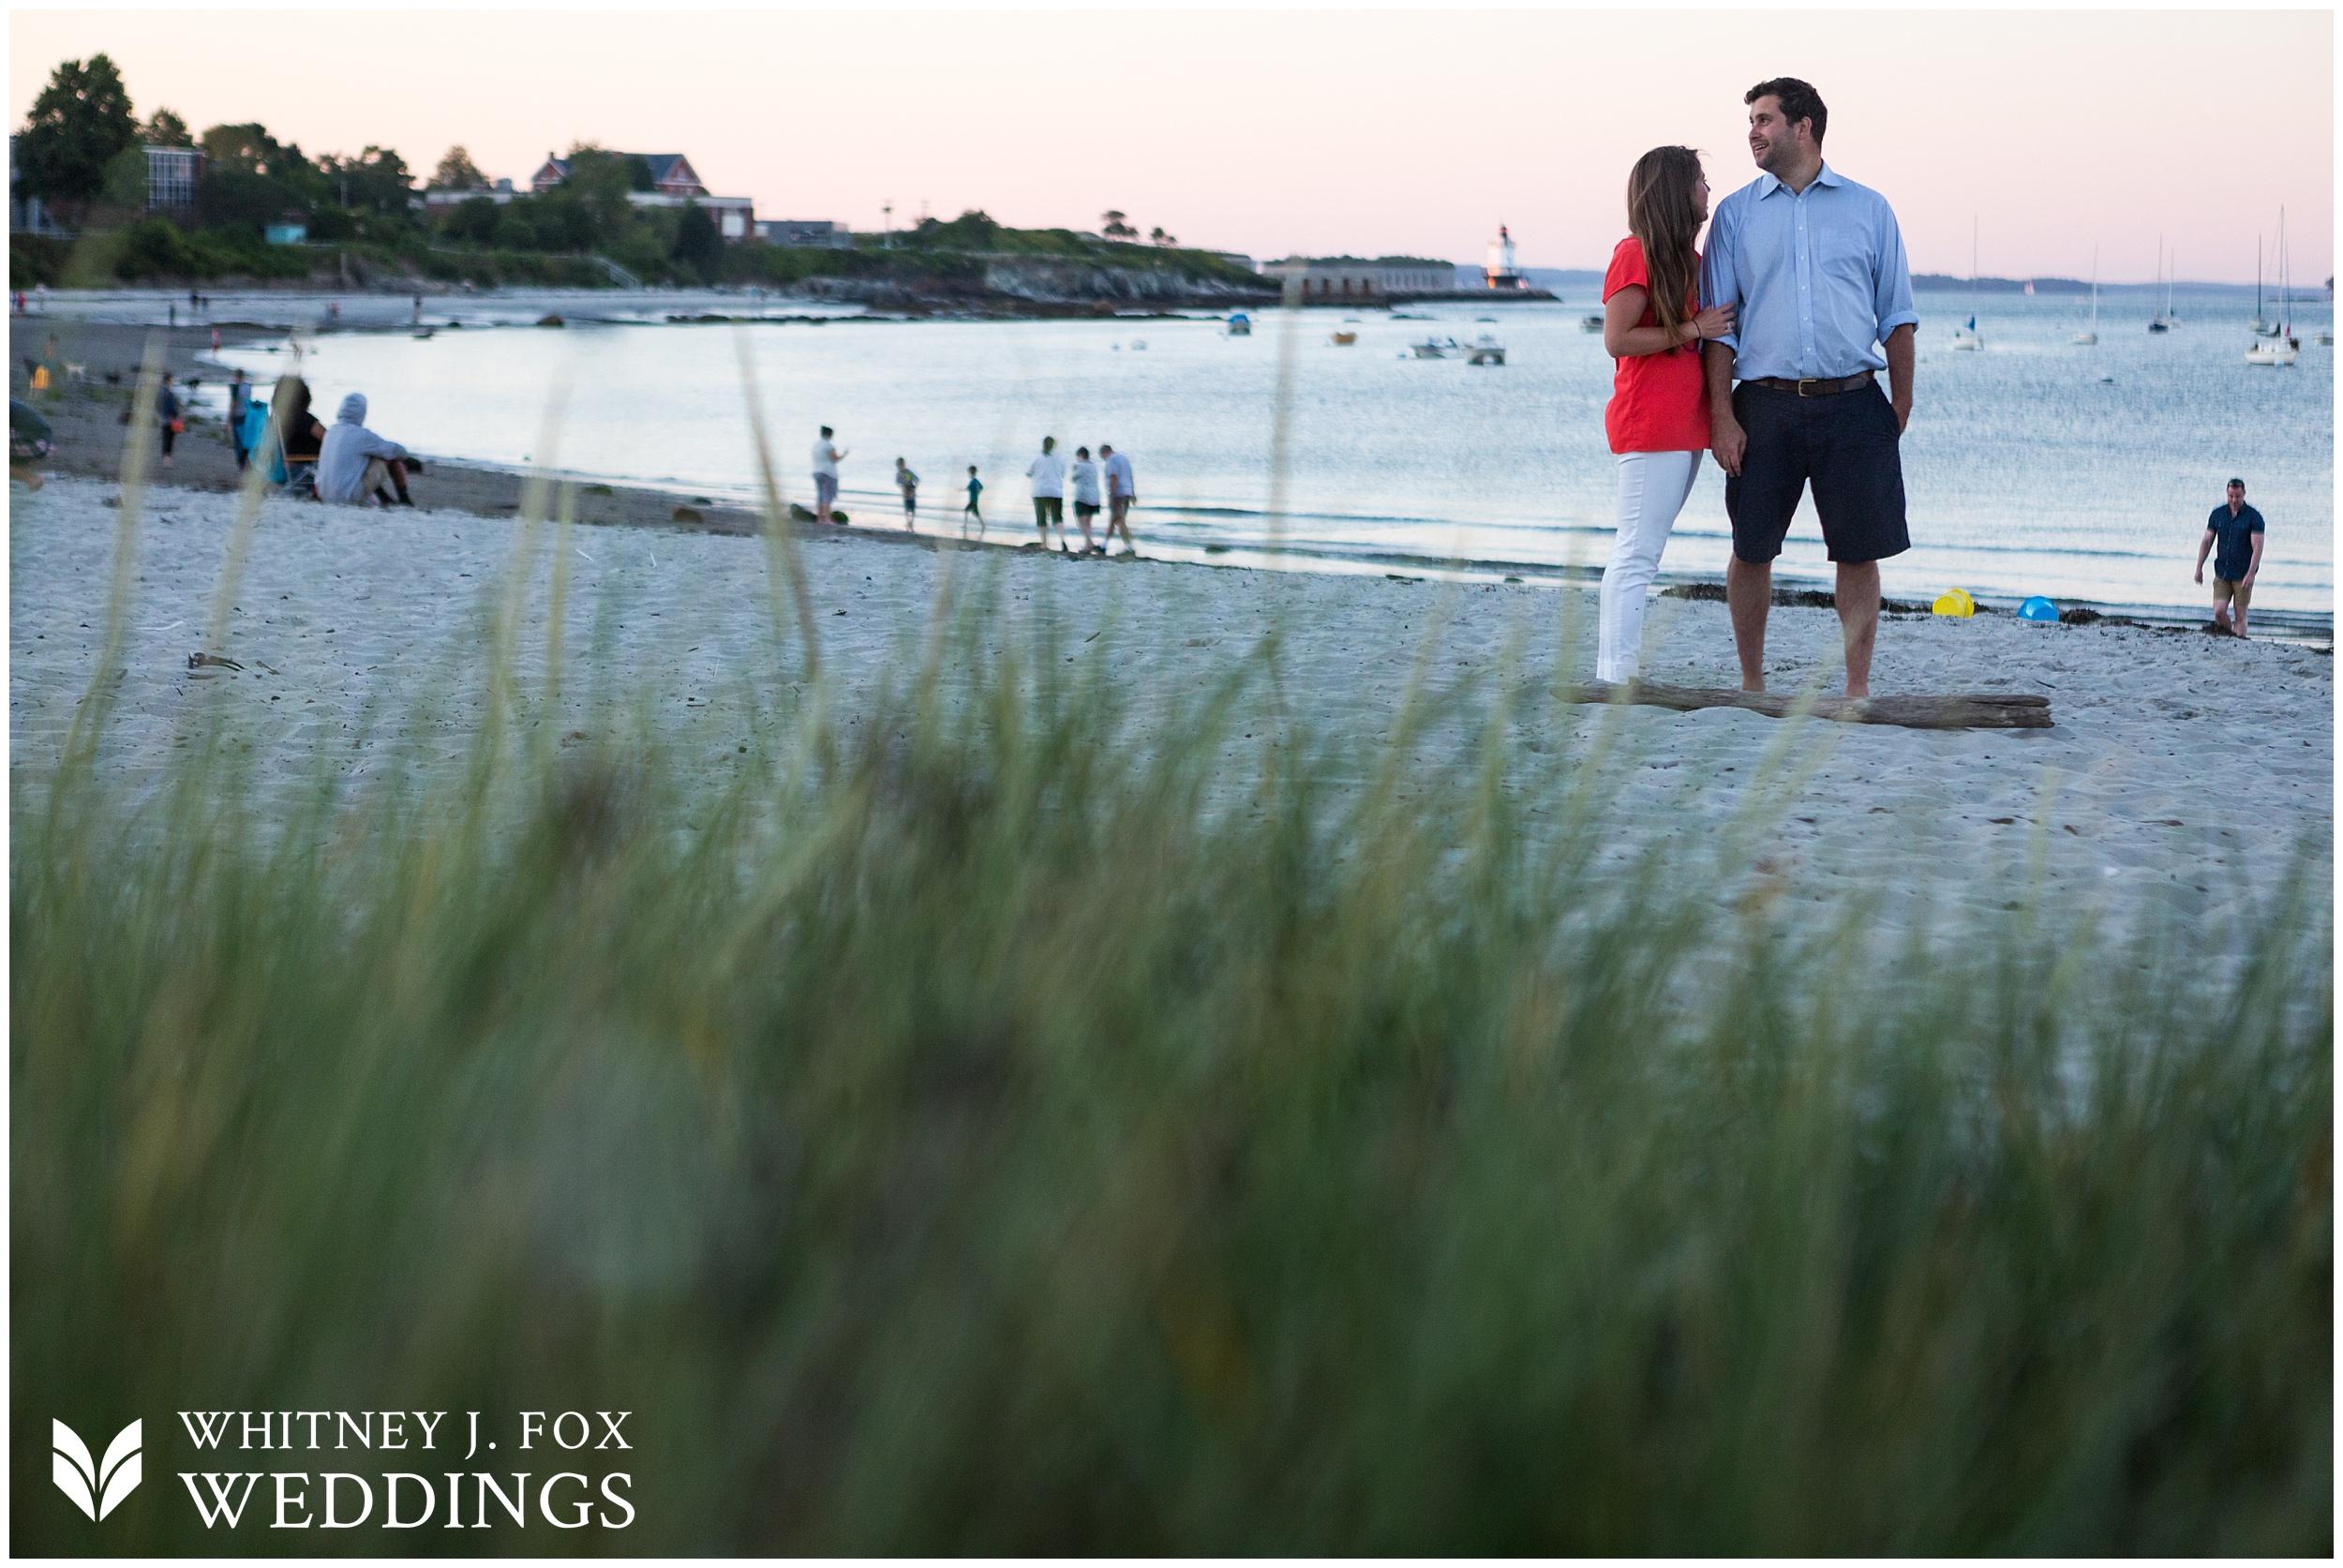 17_204_western_promenade_willard_beach_engagement_session_portland_maine_wedding_photographer_whitney_j_fox_1888.jpg